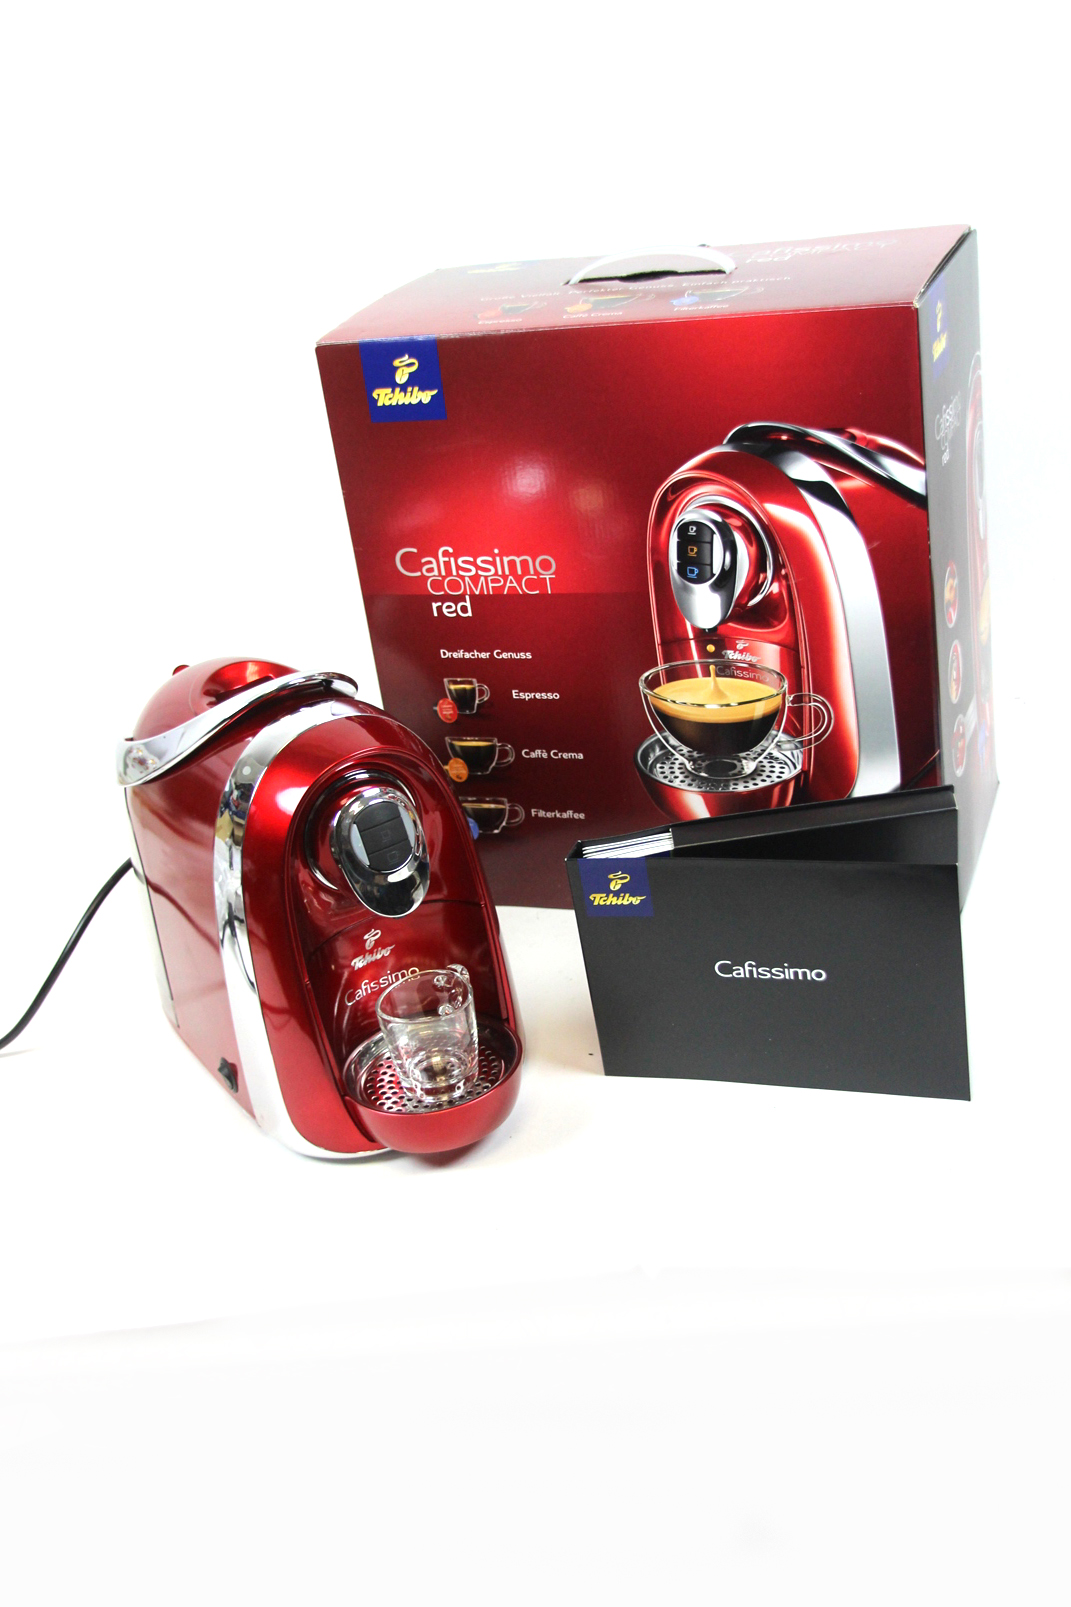 tchibo cafissimo compact red 280997 kapselmaschine. Black Bedroom Furniture Sets. Home Design Ideas